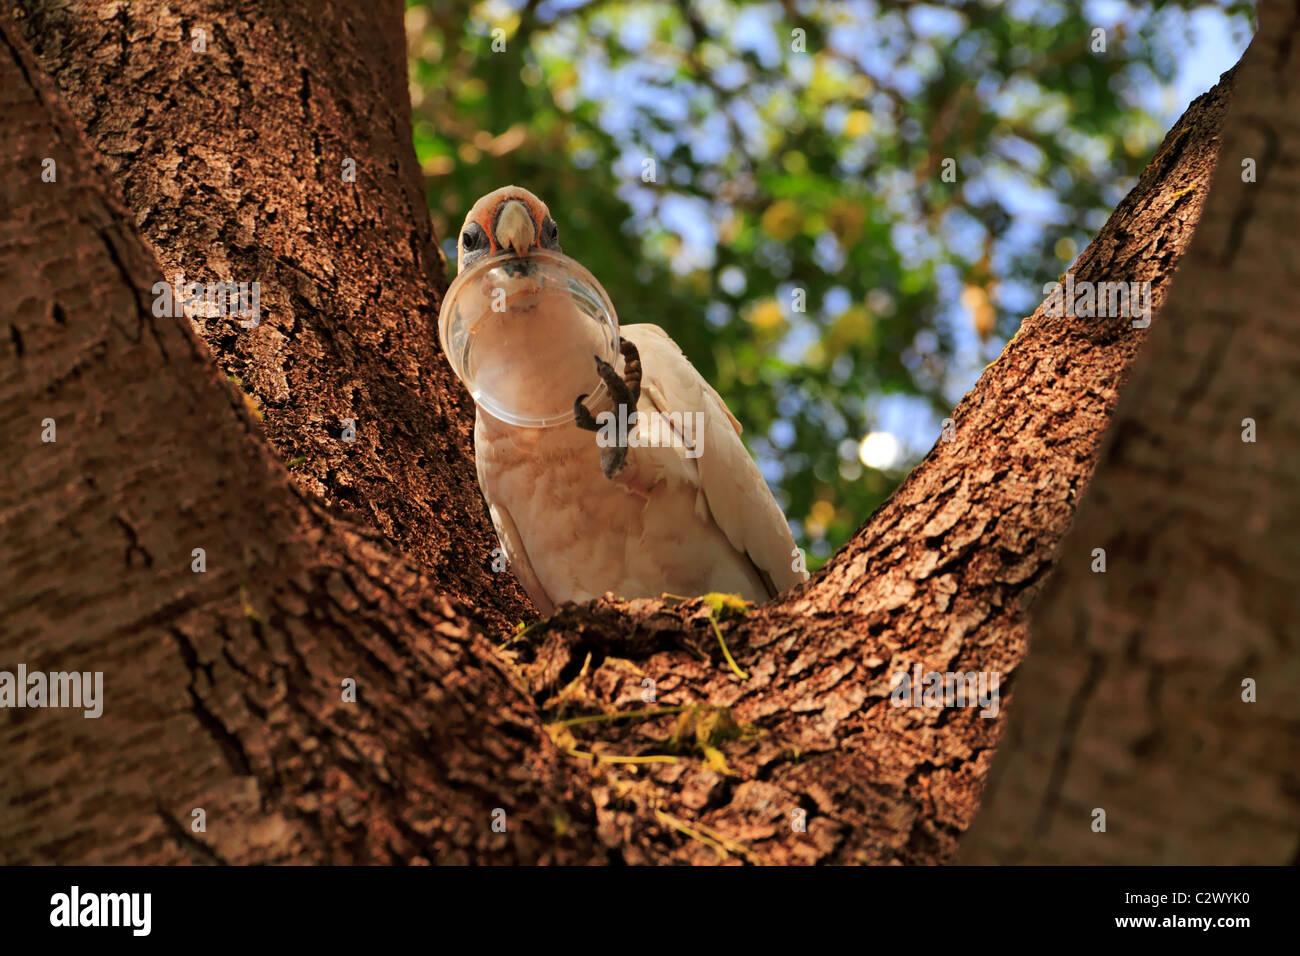 Little Corella Cockatoo ( Cacatua pastinator ) in a tree with plastic container in its beak, Pilbara, Northwest - Stock Image